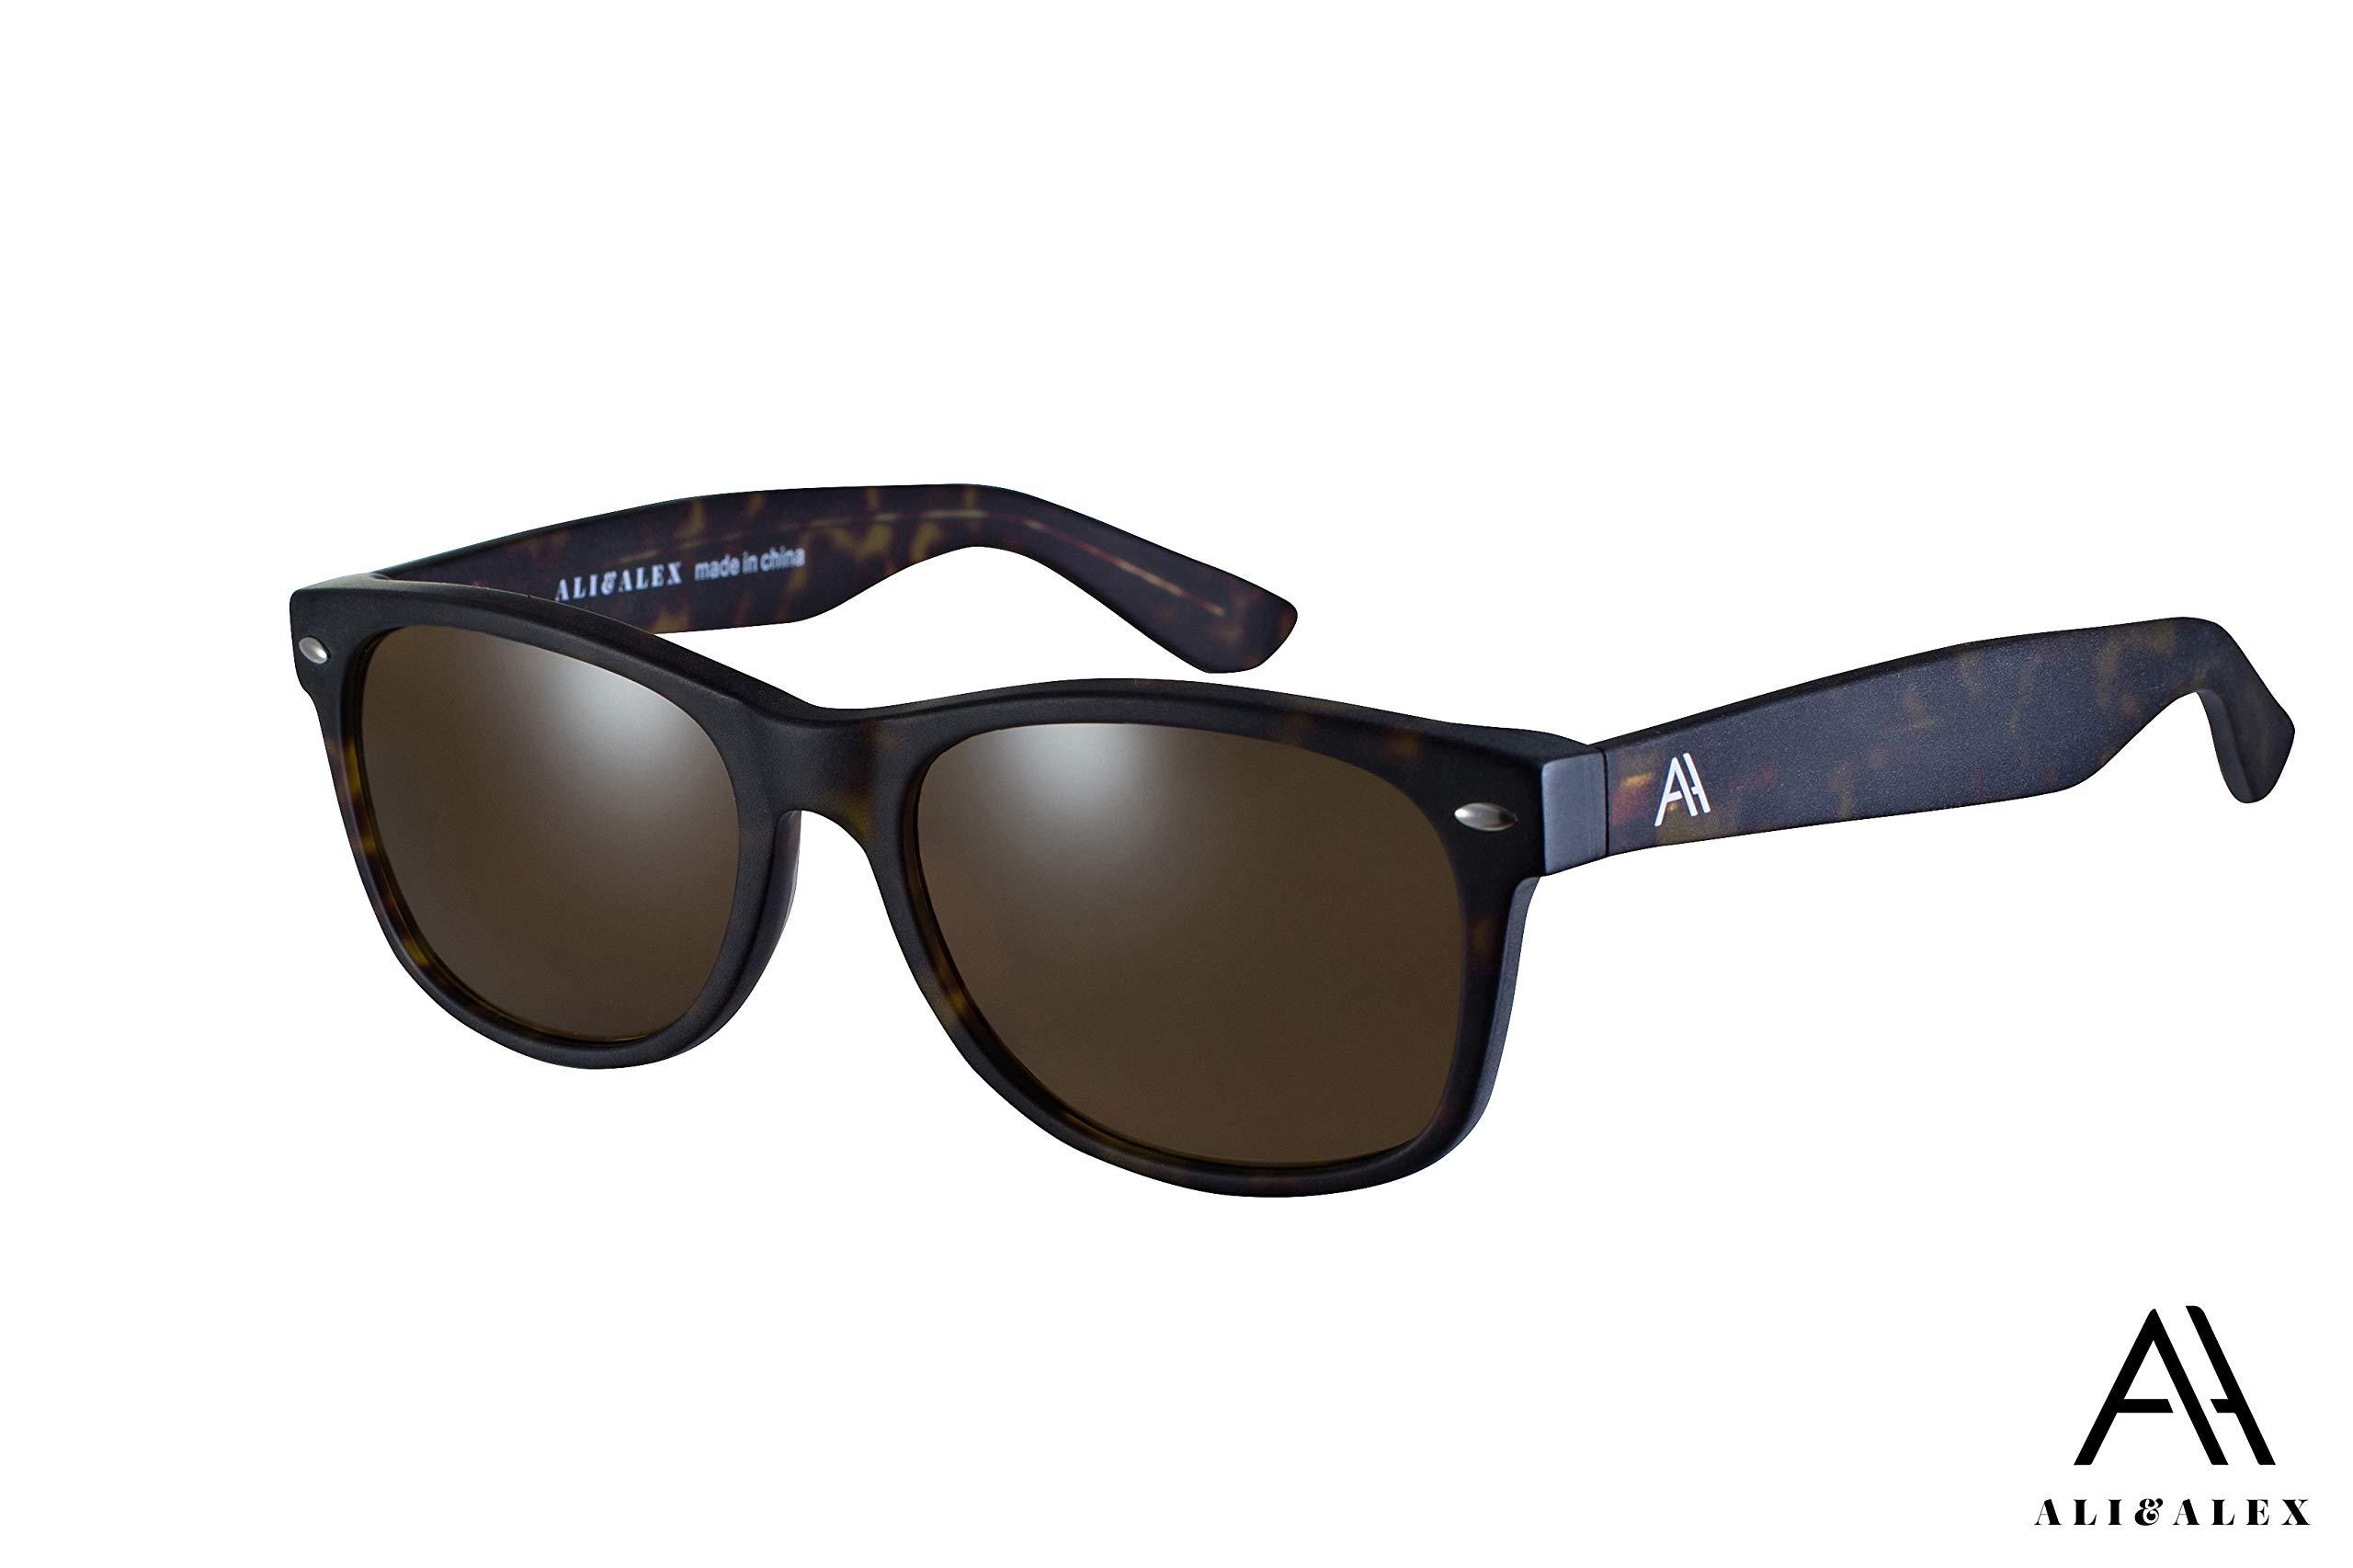 Ali&Alex Classic Square 100% UV Polarized Adult Unisex Designer Sunglasses by Ali&Alex